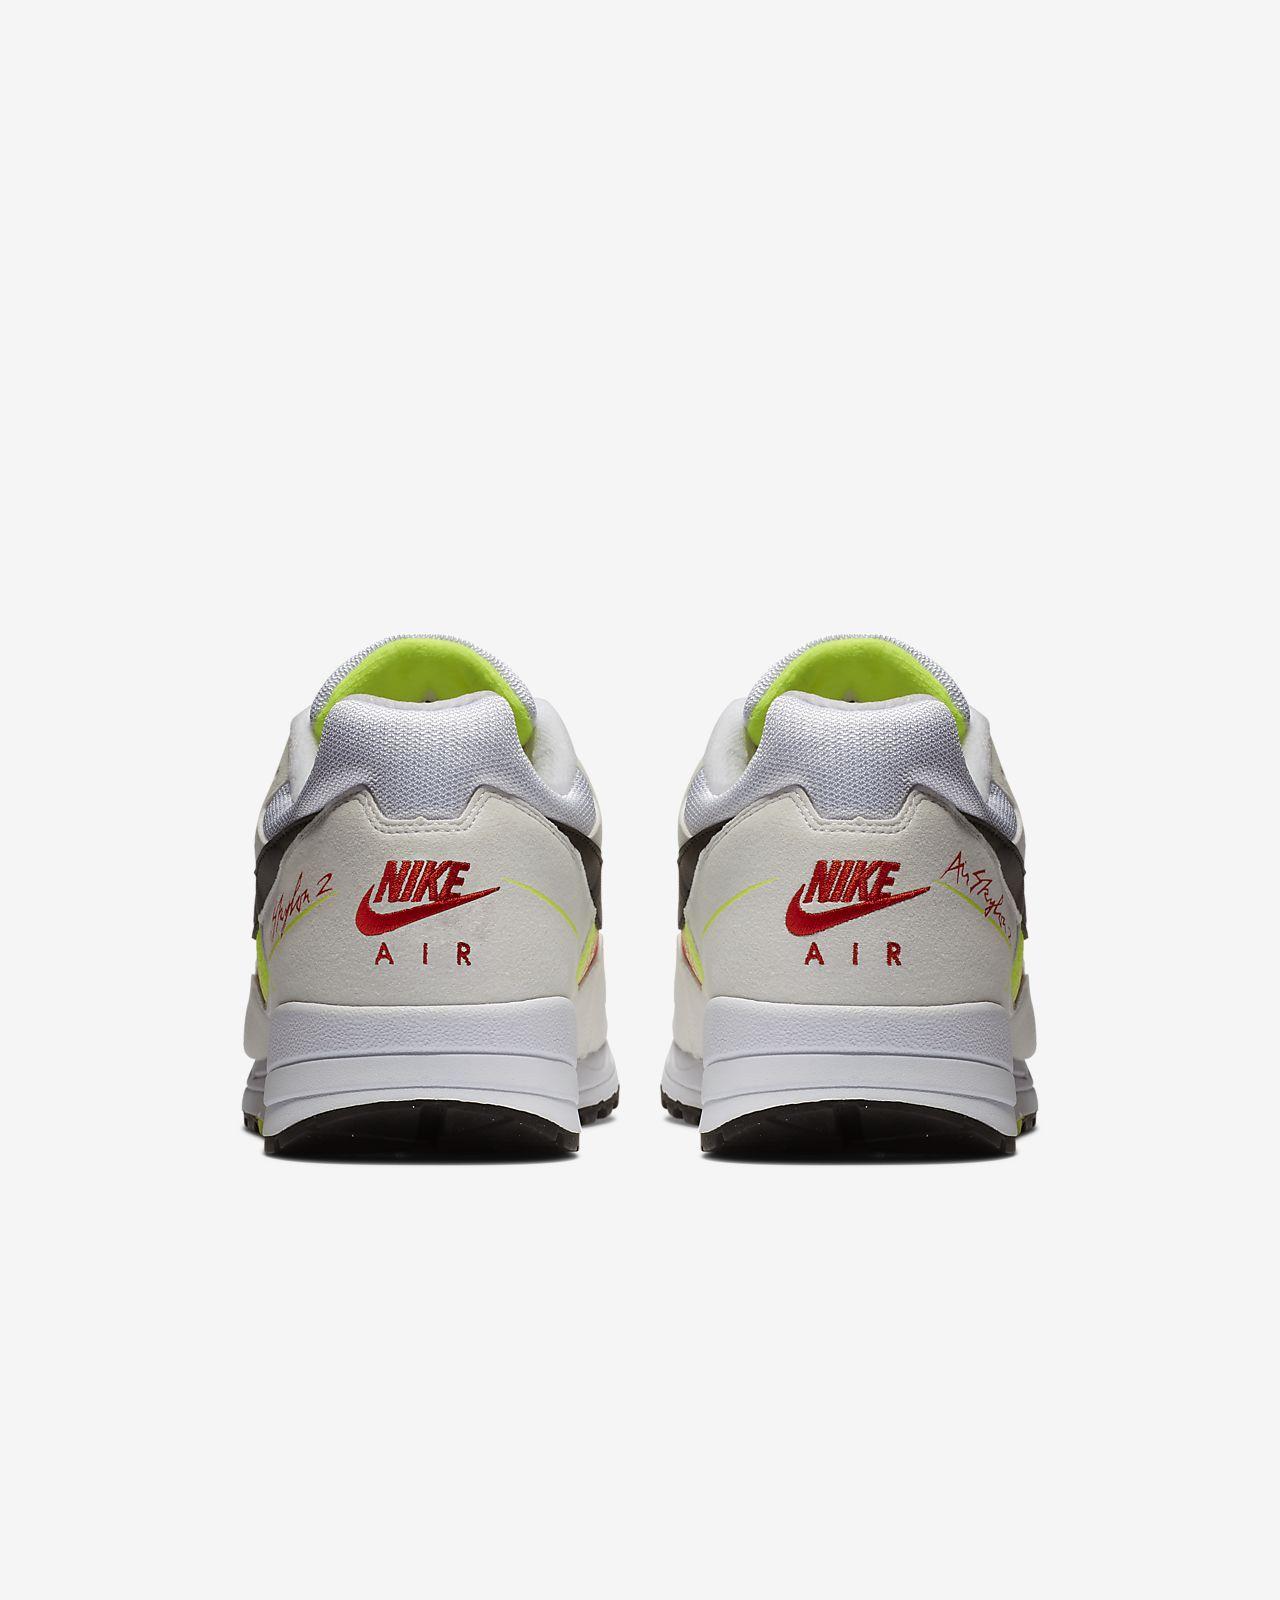 new product 9acbe 277f3 ... Nike Air Skylon II Men s Shoe